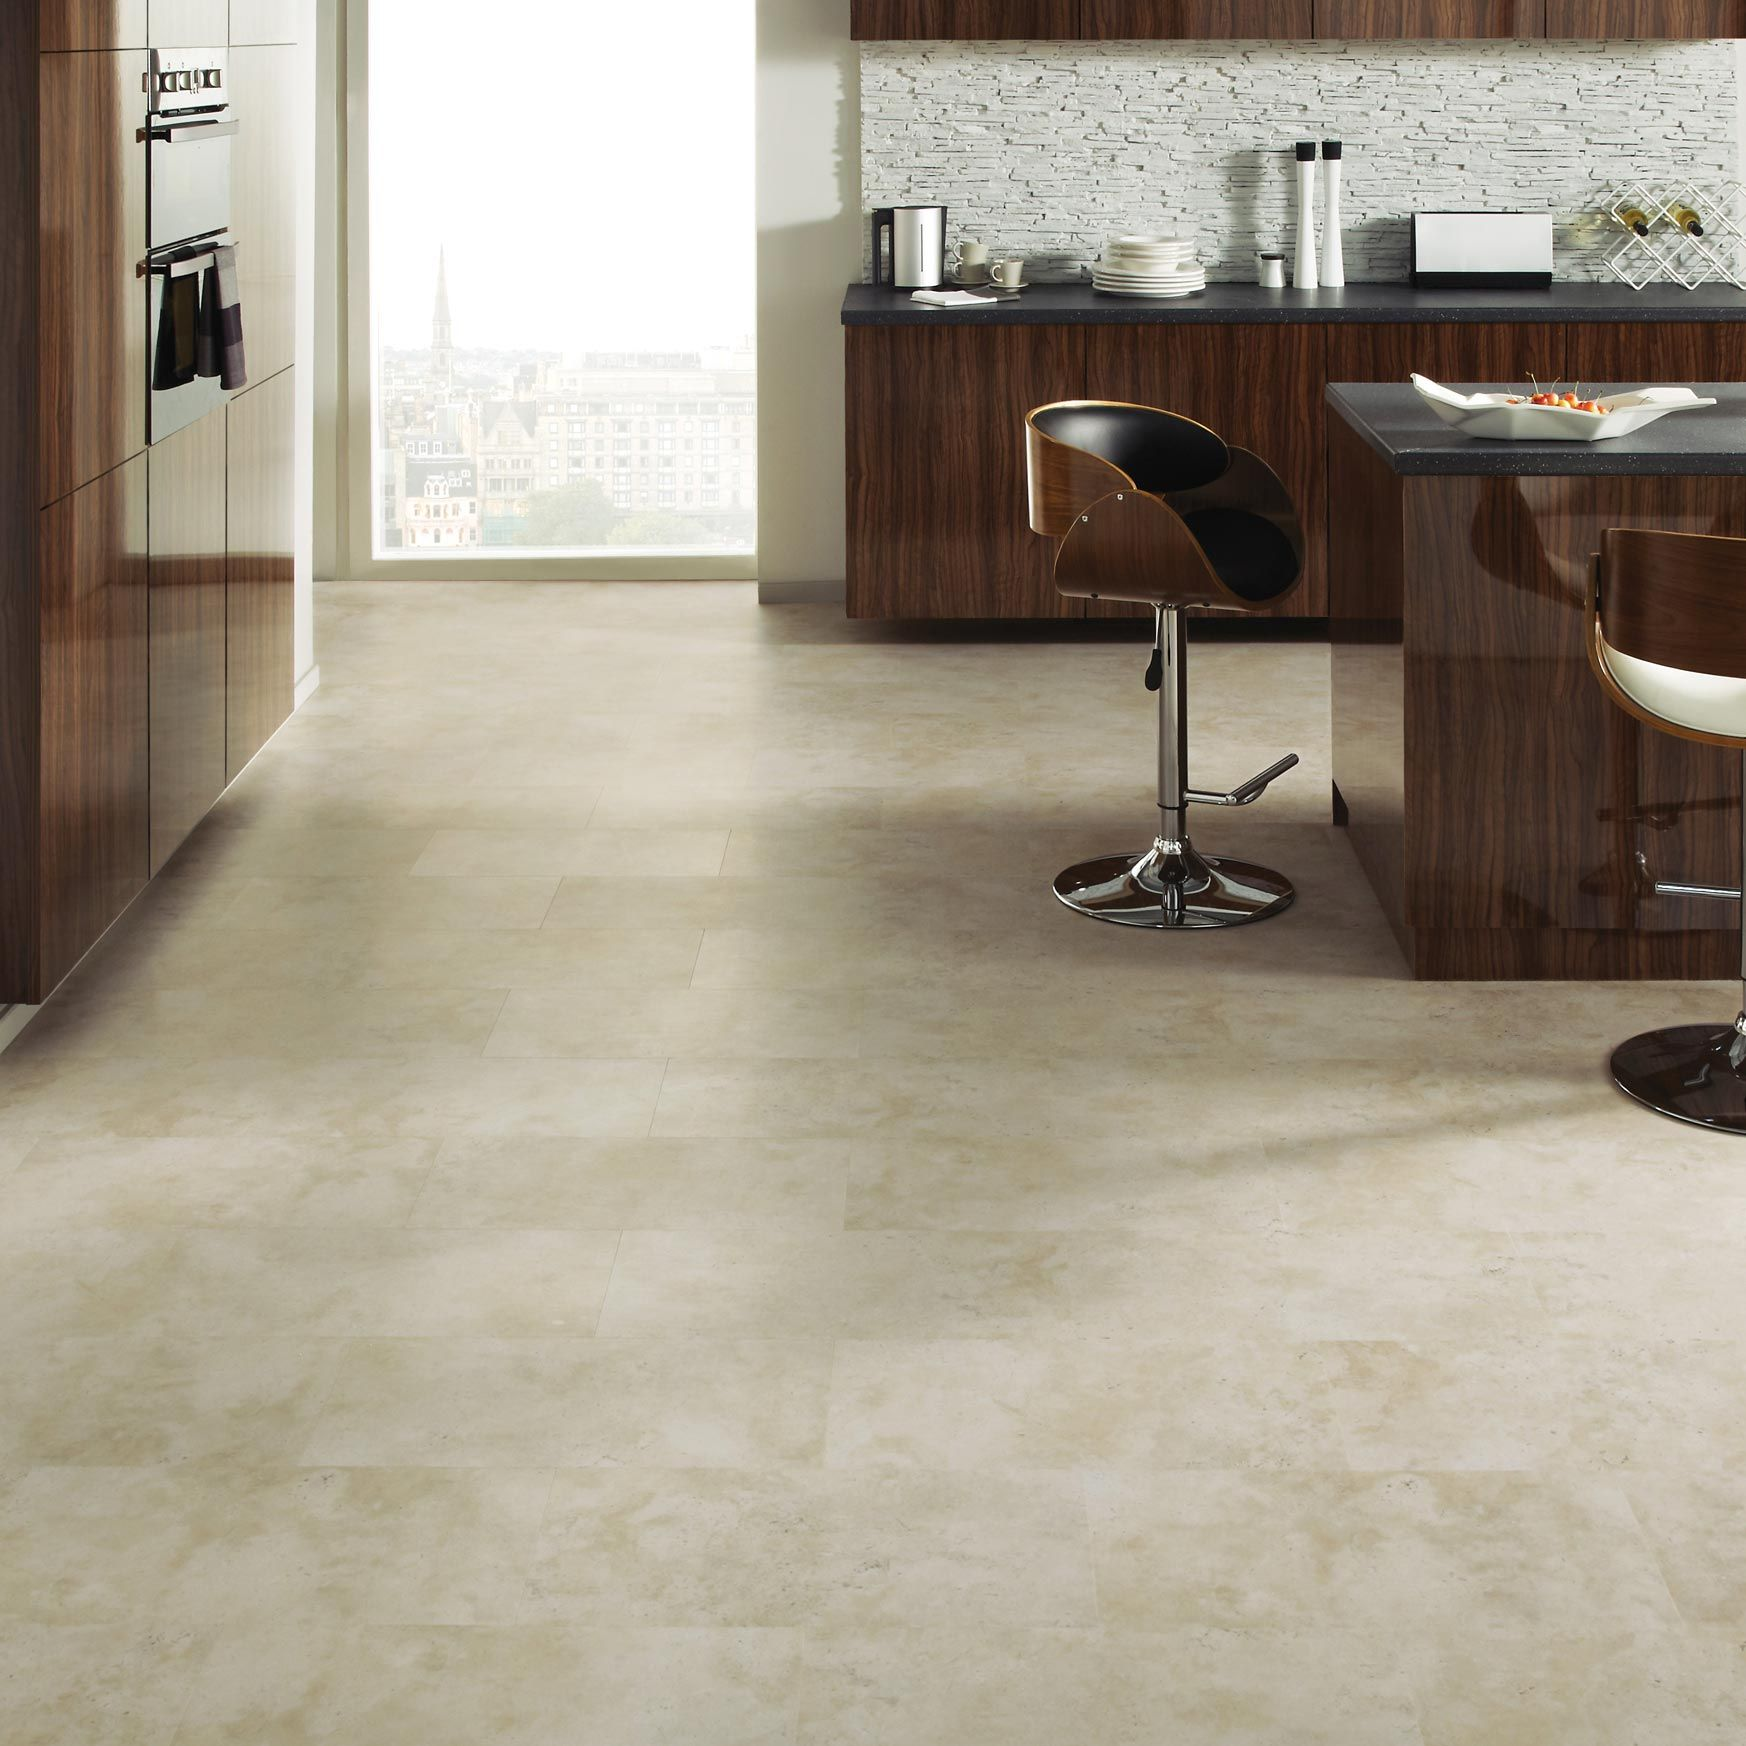 Karndean Palio Murlo CT4302 Clic Vinyl Tile - Factory Direct ...